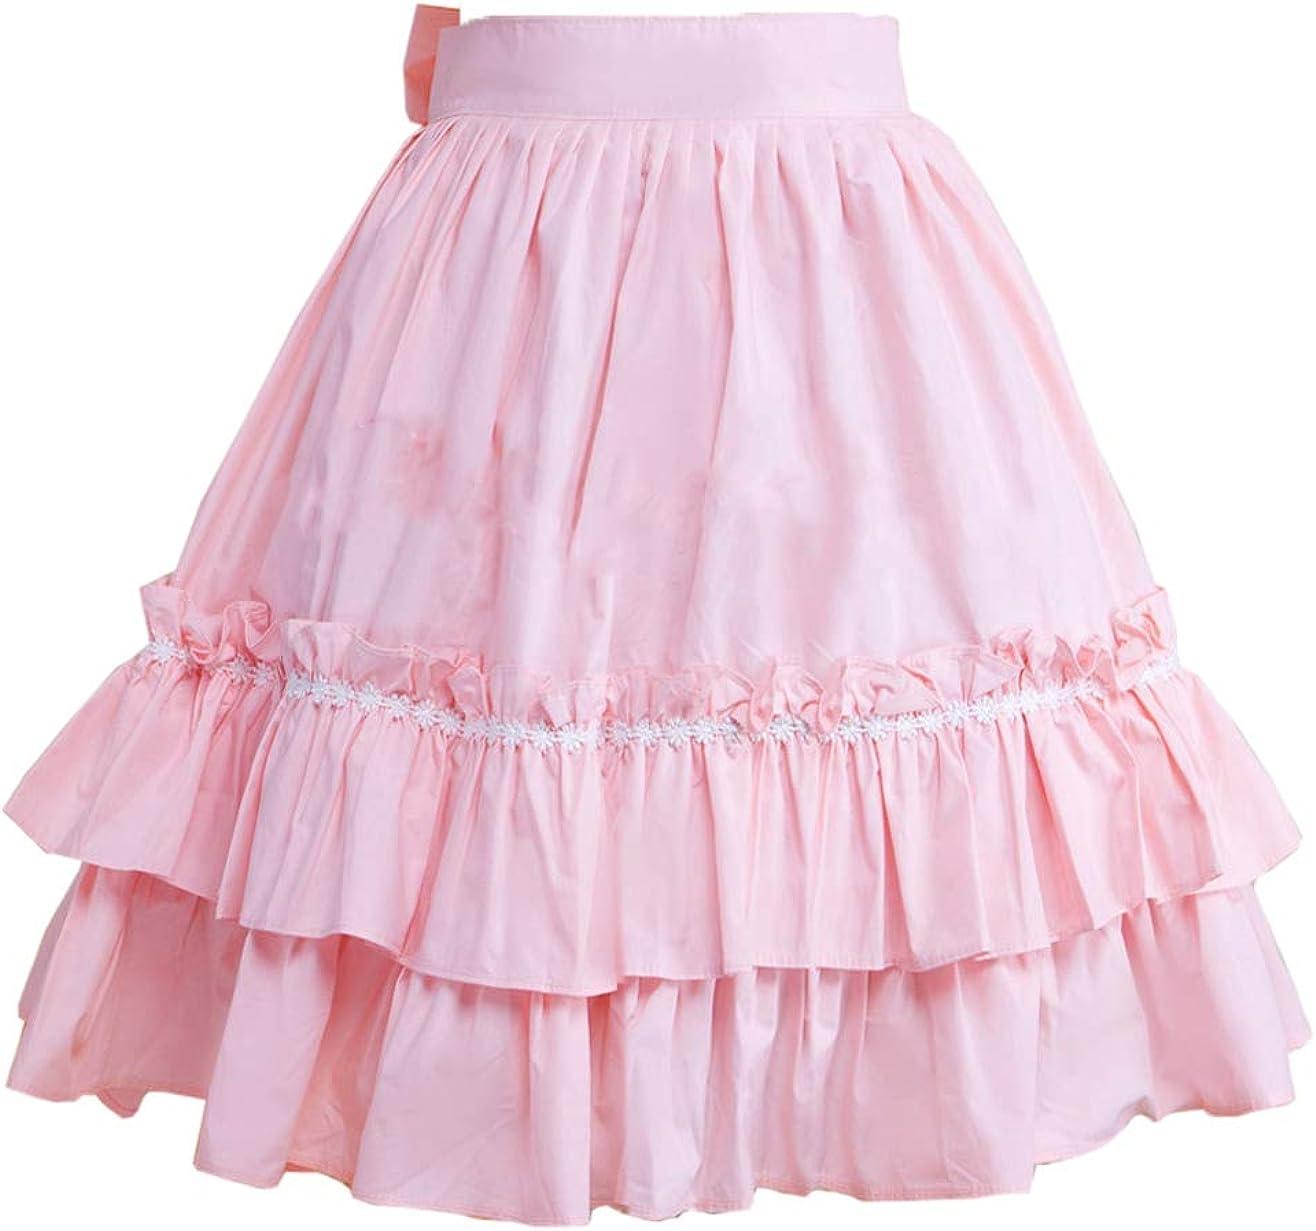 Antaina Pink Ruffled Layered Bow Sweet Cotton Princess Lolita Tutu Skirts